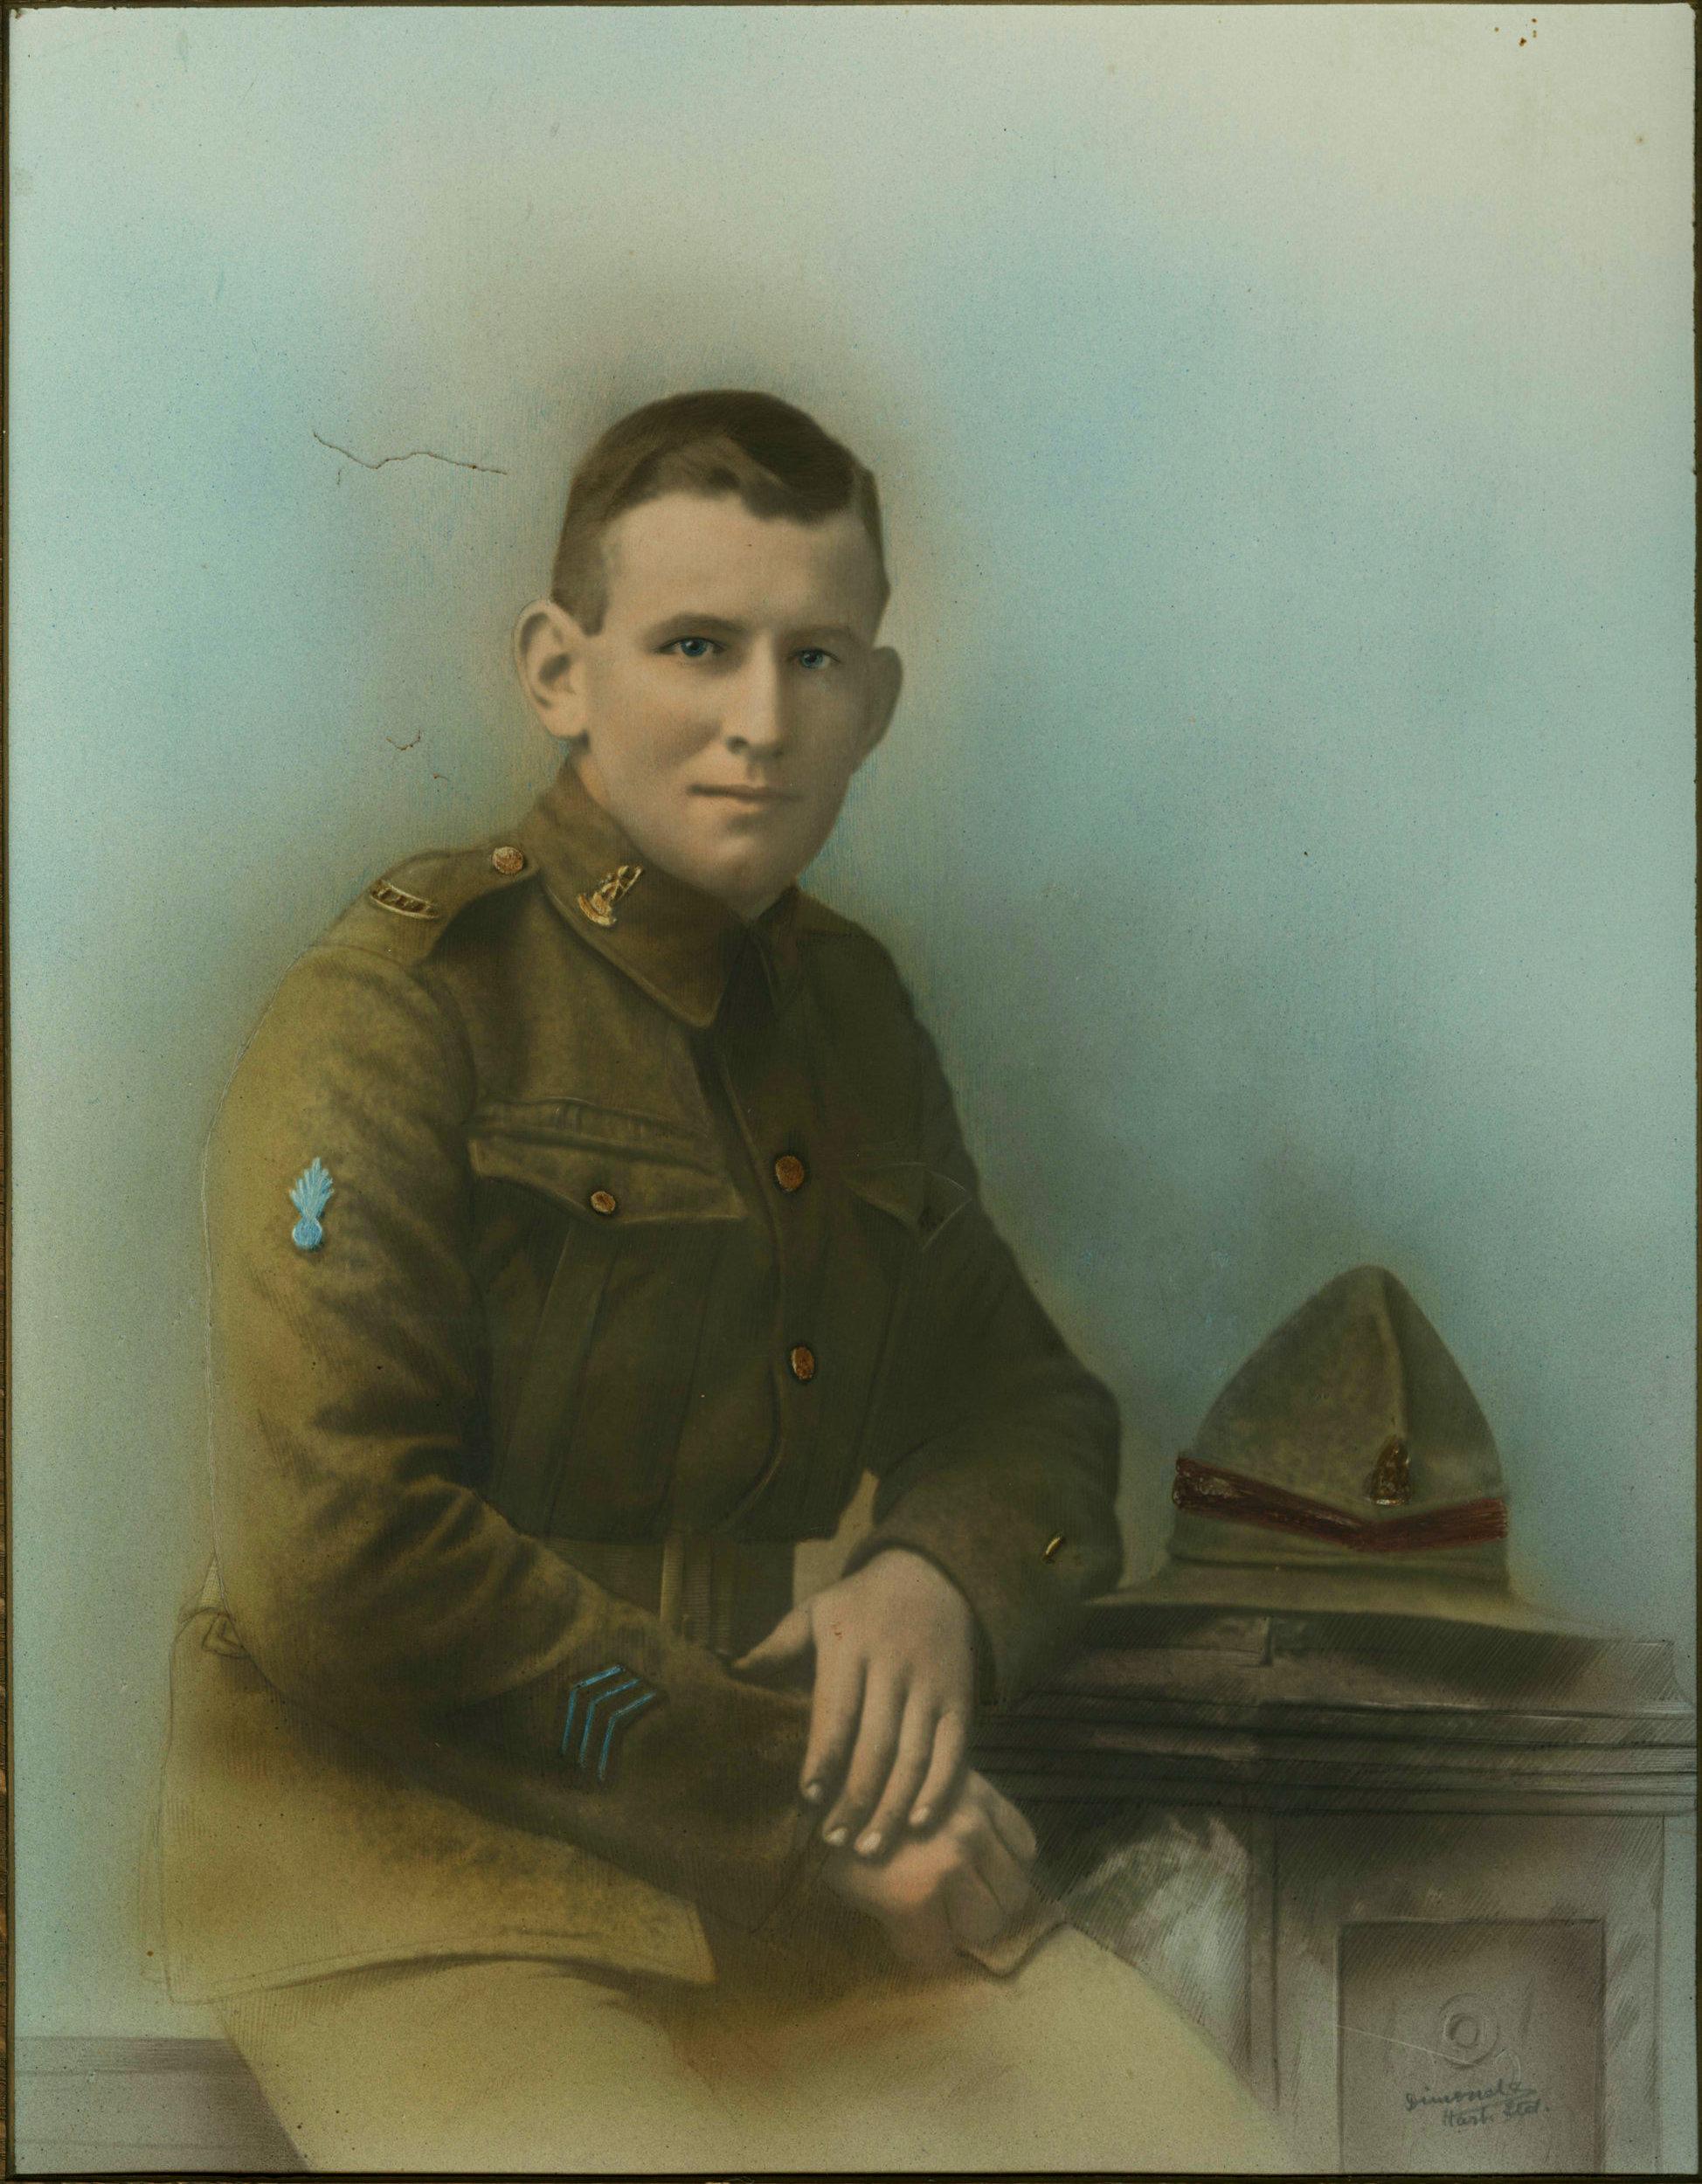 John Leo O'Keefe - this is one of several large colour portraits of John Leo O'Keefe.